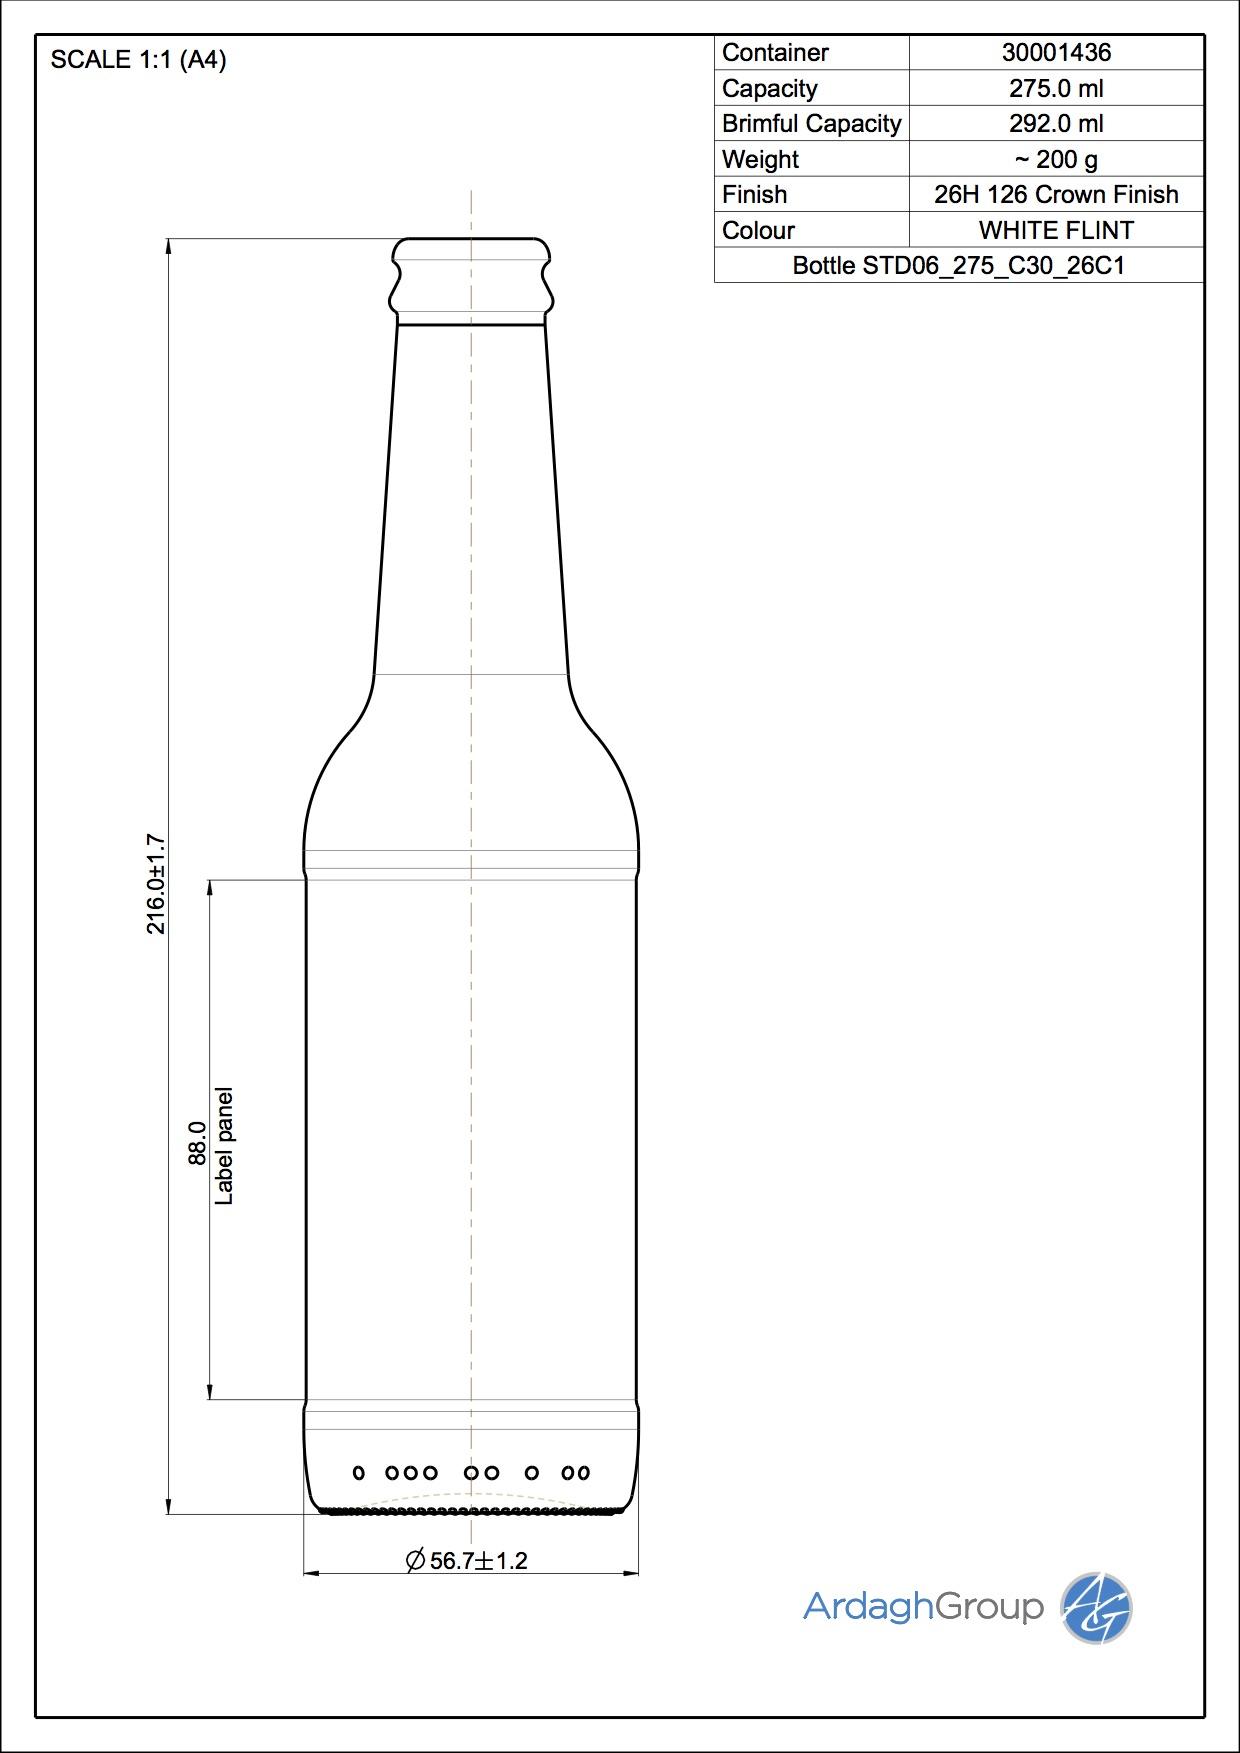 Bottle STD06 275 C30 26C1